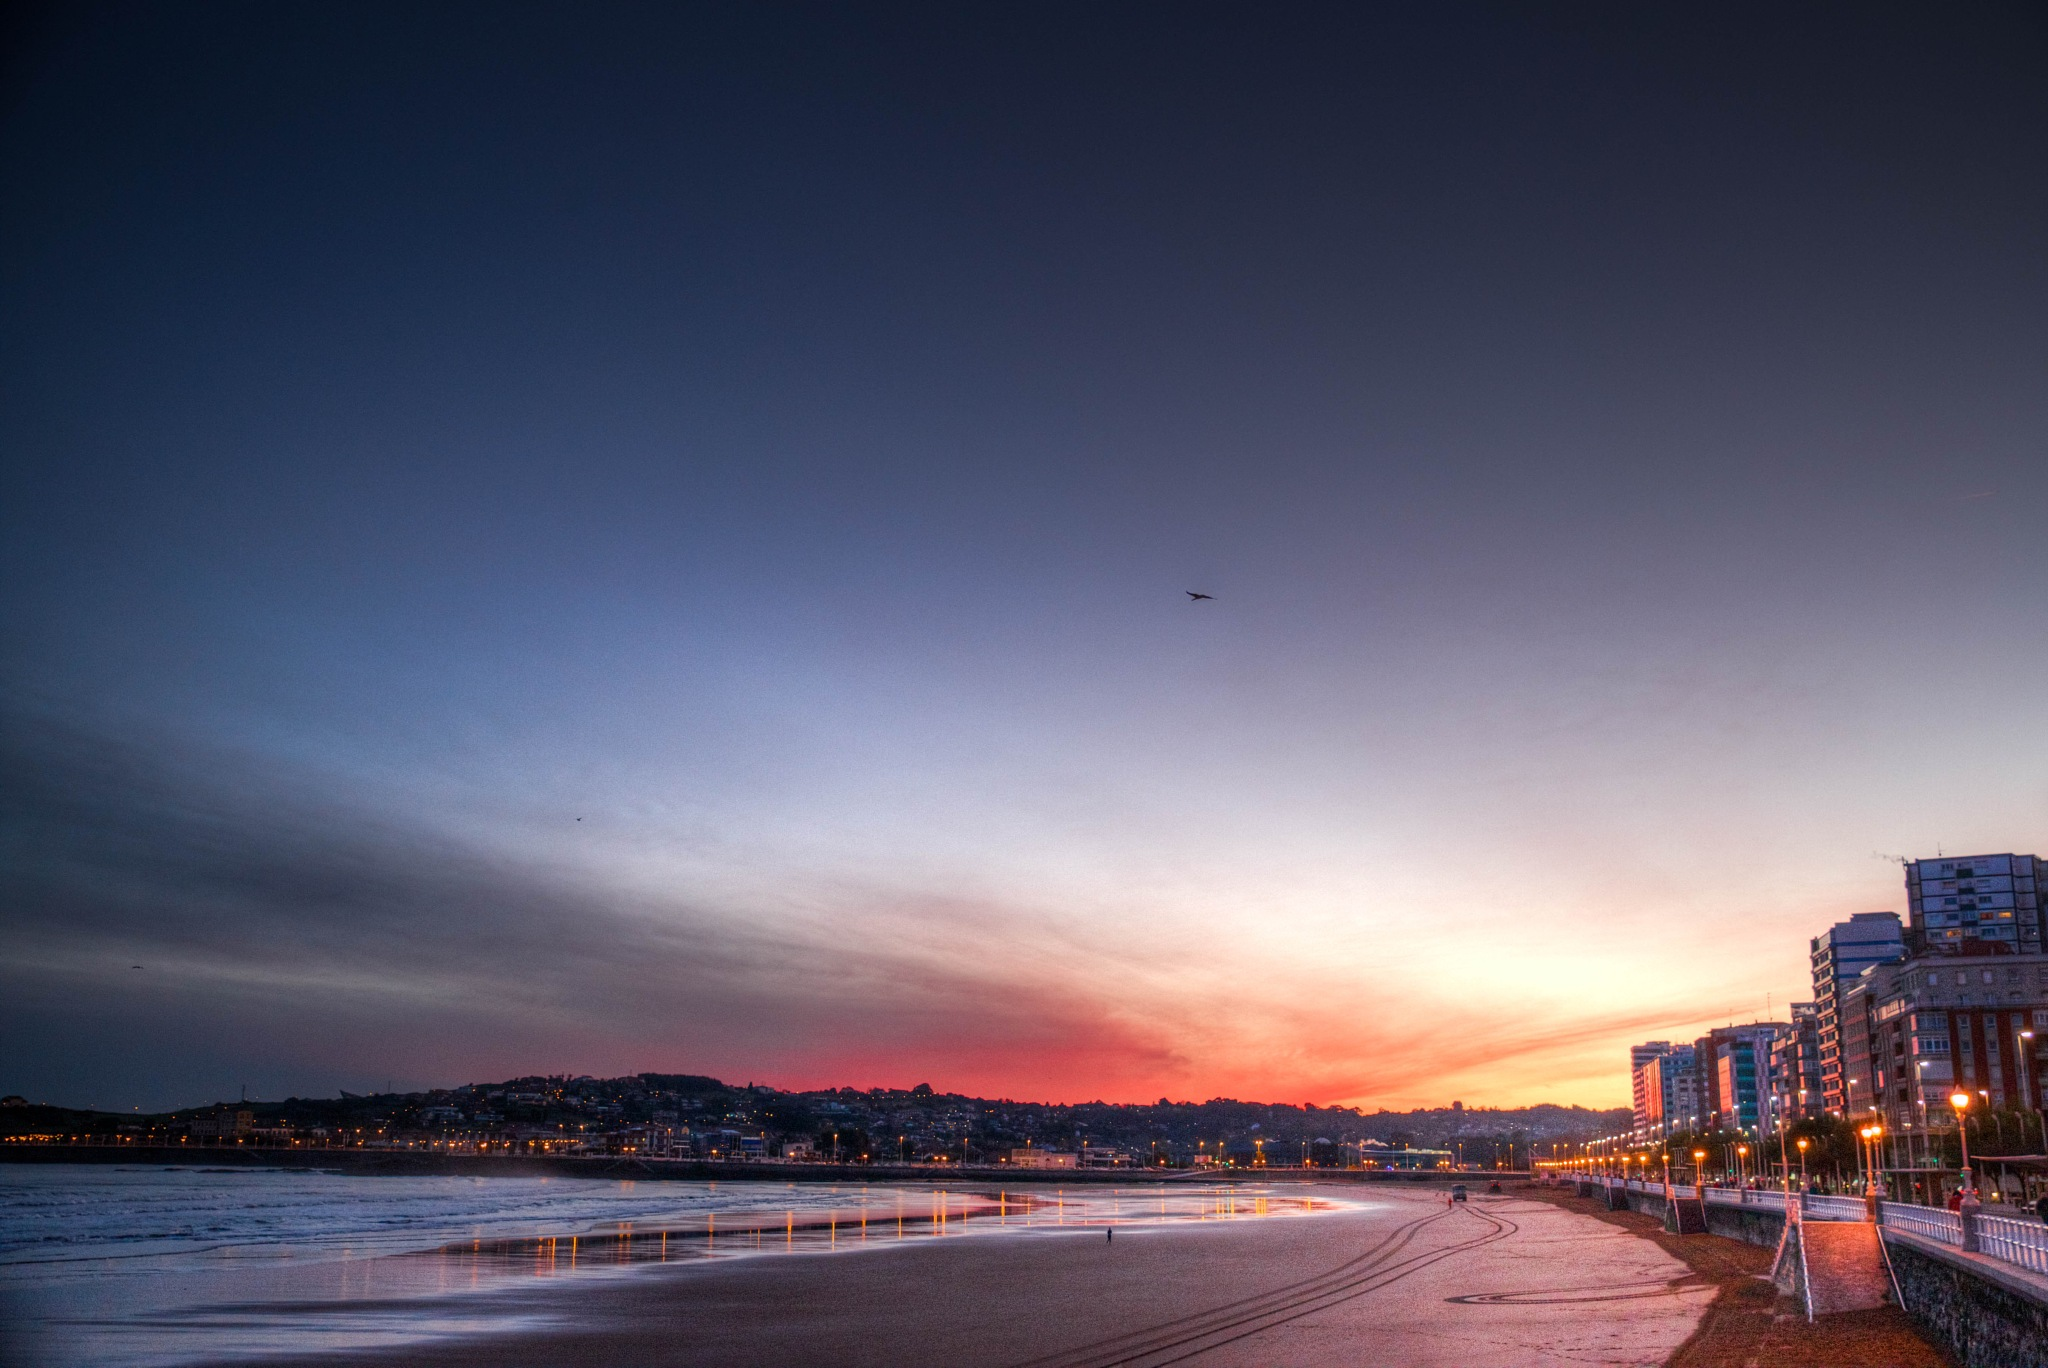 En el Cielo (In the Sky) by Marco Gonzalez